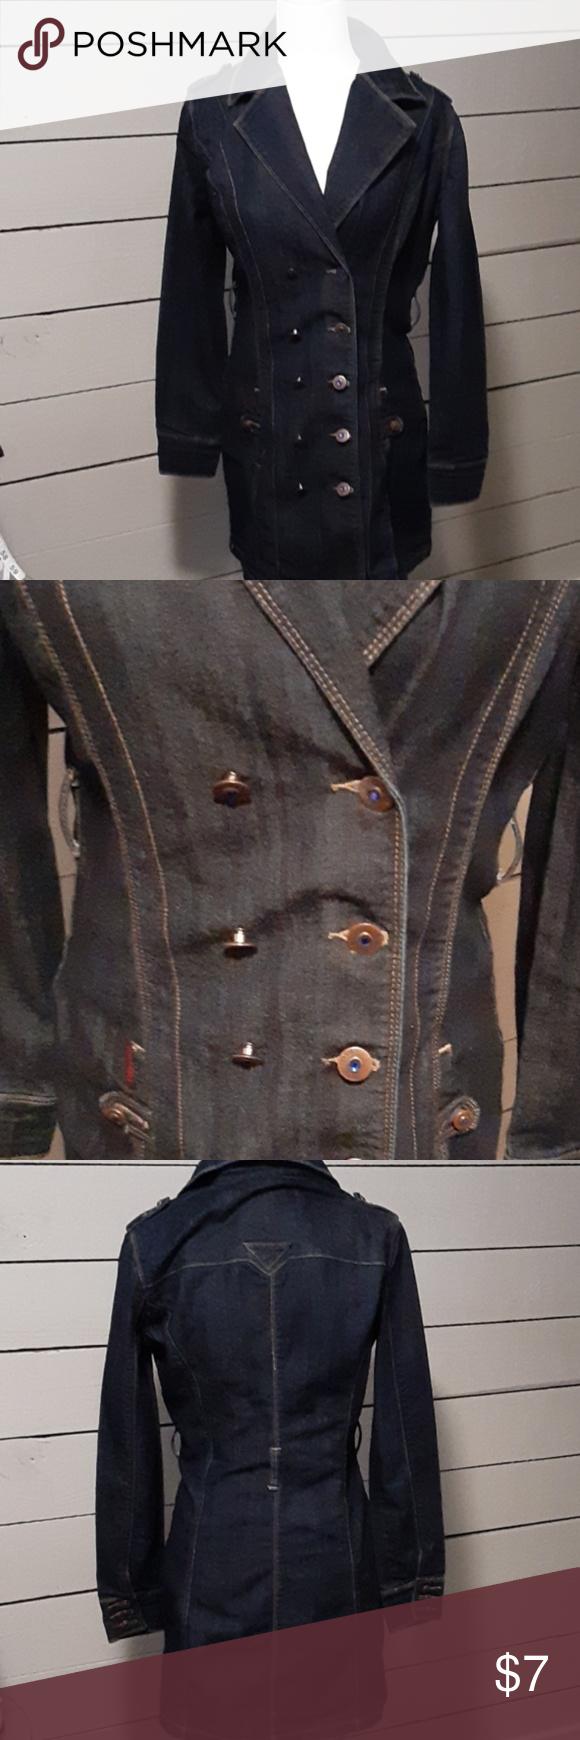 Jou Jou denim dress 0380c Fitted denim dress Double breasted cut Belt not available  Shoulder to hem 34 inches Jou Jou Dresses Midi